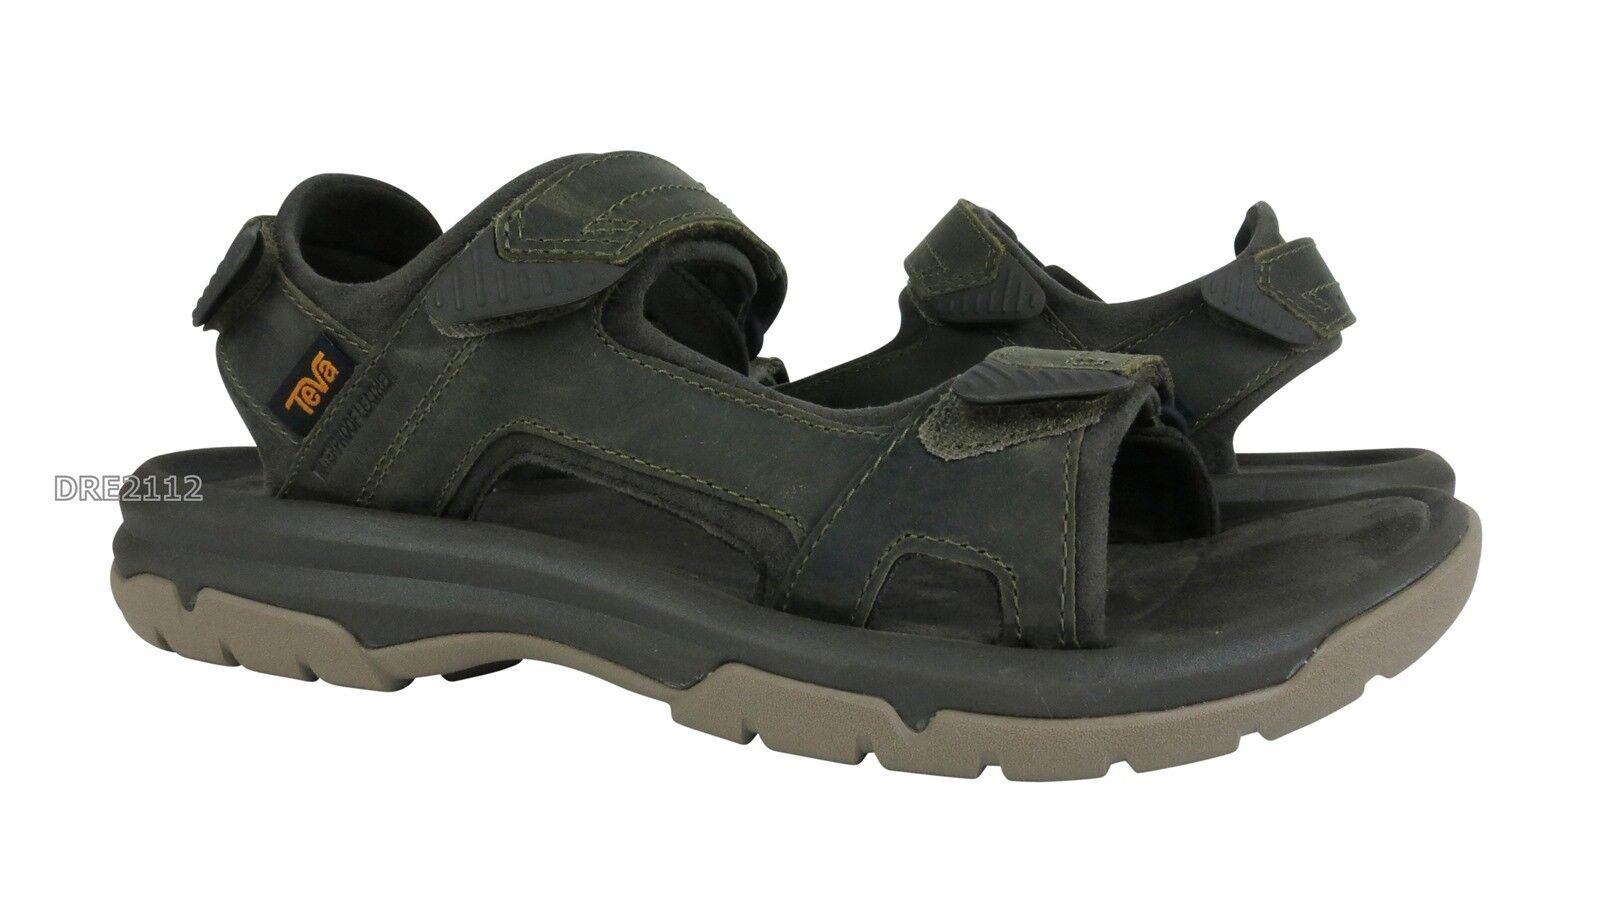 Sandali e scarpe per il mare da uomo Teva Langdon Sandal Olive Leather Sandals uomos Size 9 *NIB*